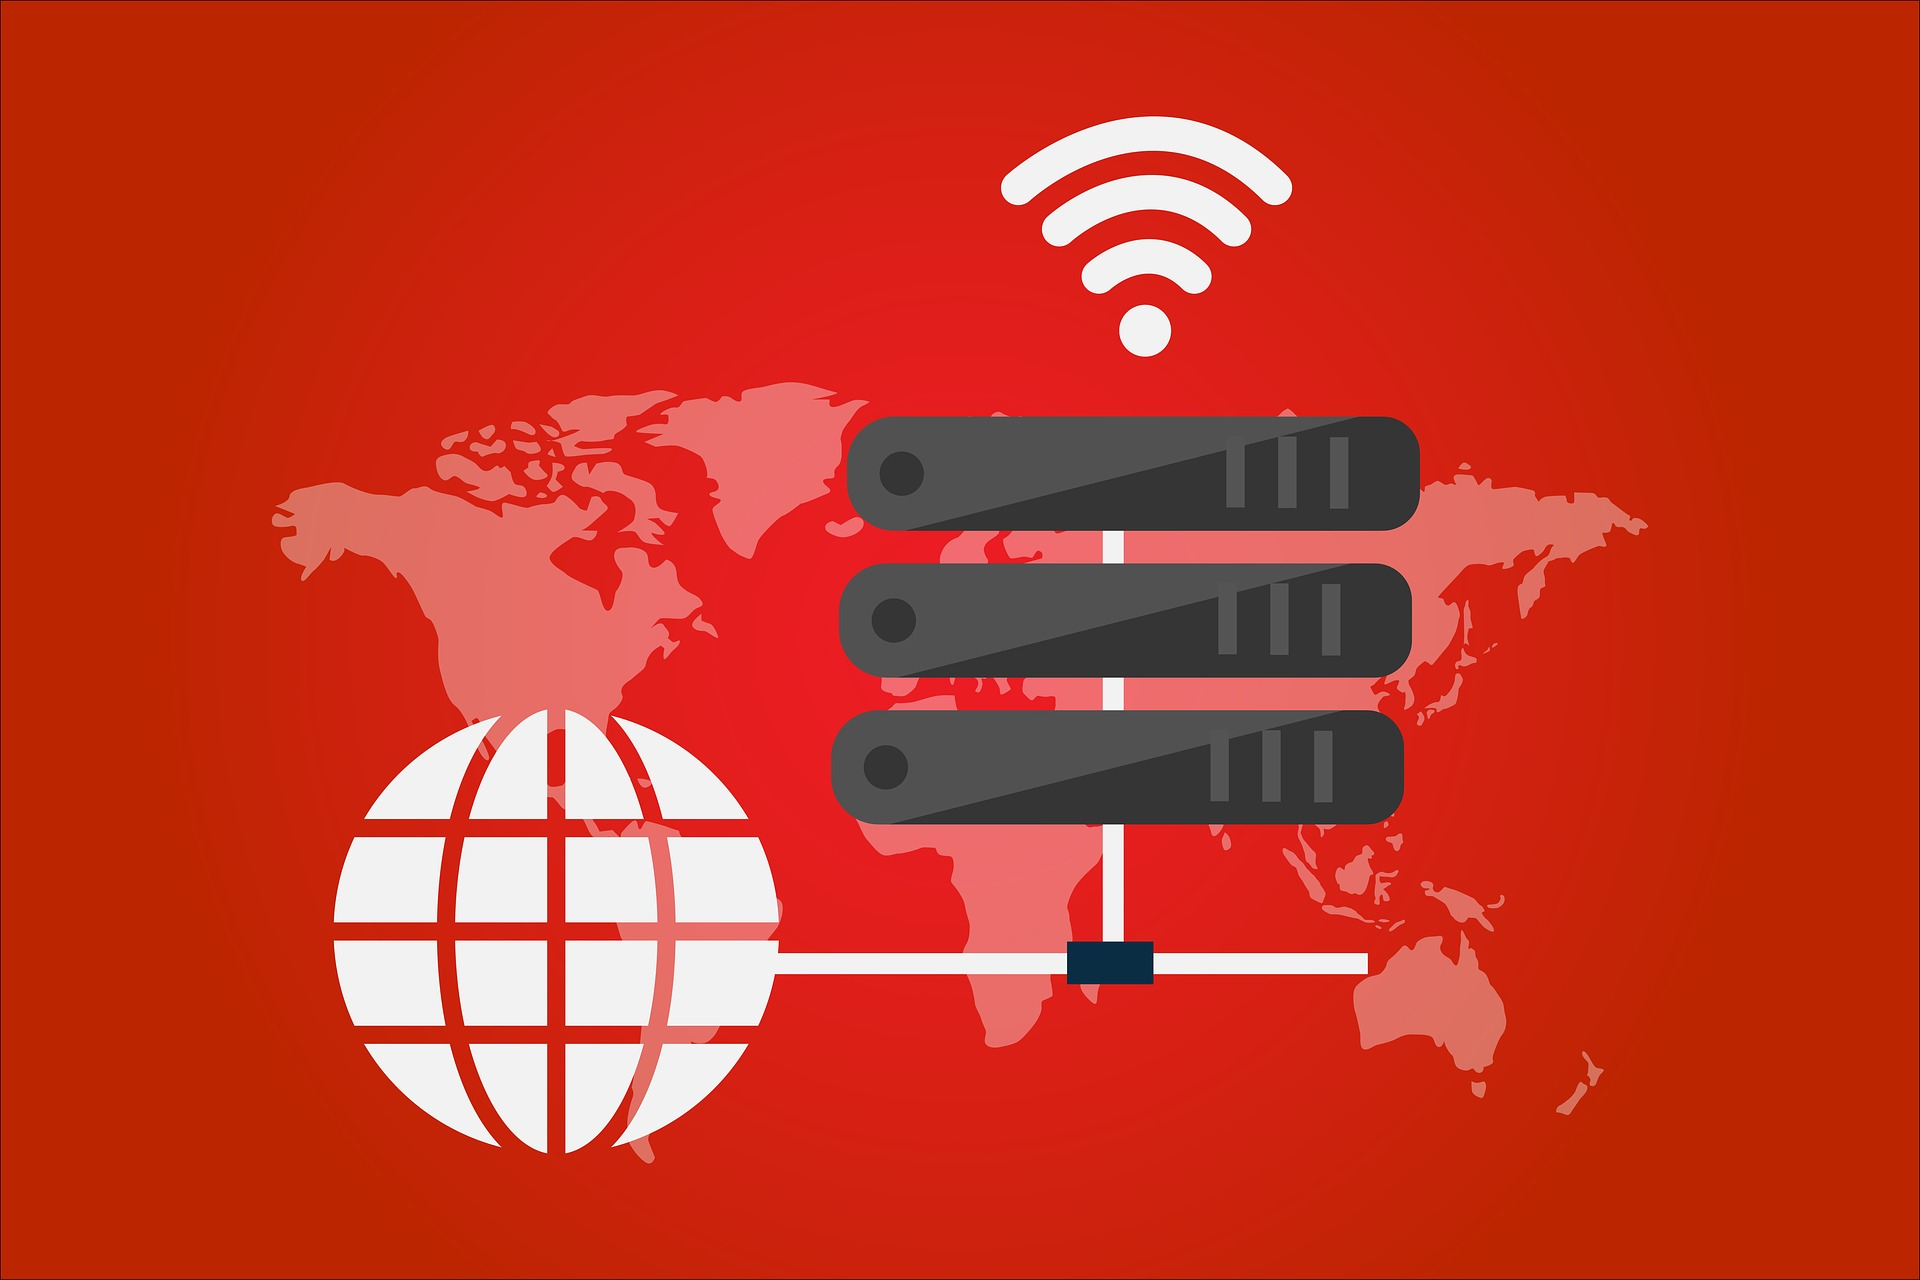 Apa itu Proxy Server : Defenisi, Manfaat, Keunggulan, Cara Kerja